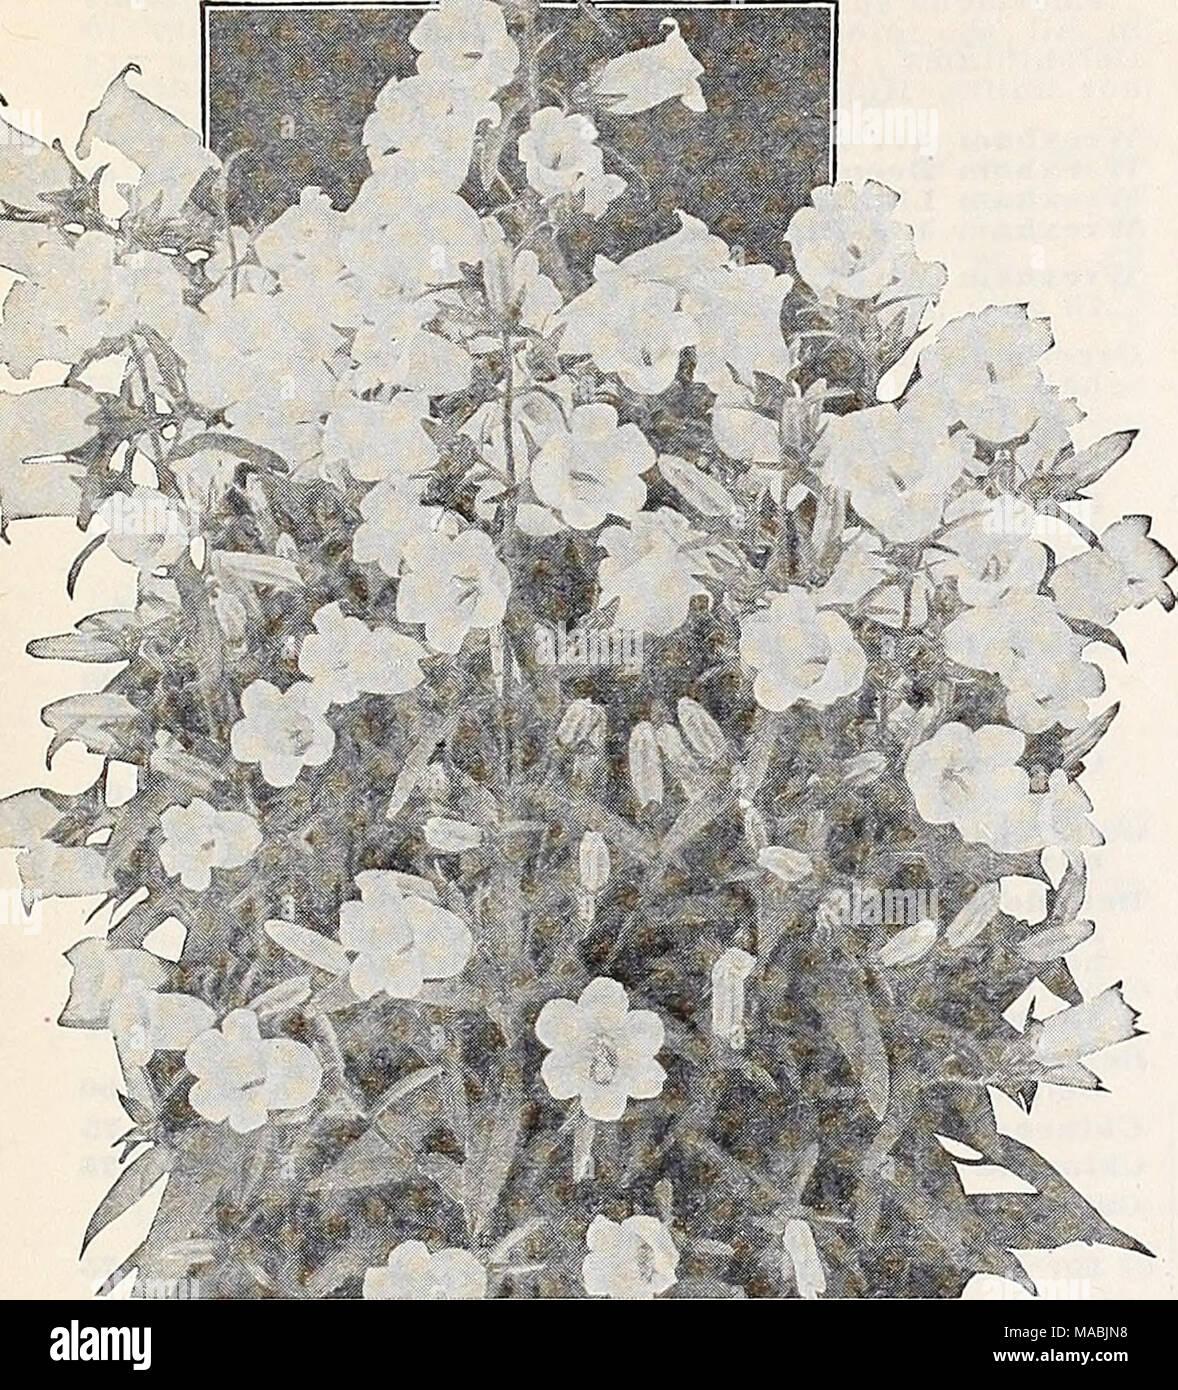 Dreers wholesale price list for florists special spring edition dreers wholesale price list for florists special spring edition canterbury bella arabia mightylinksfo